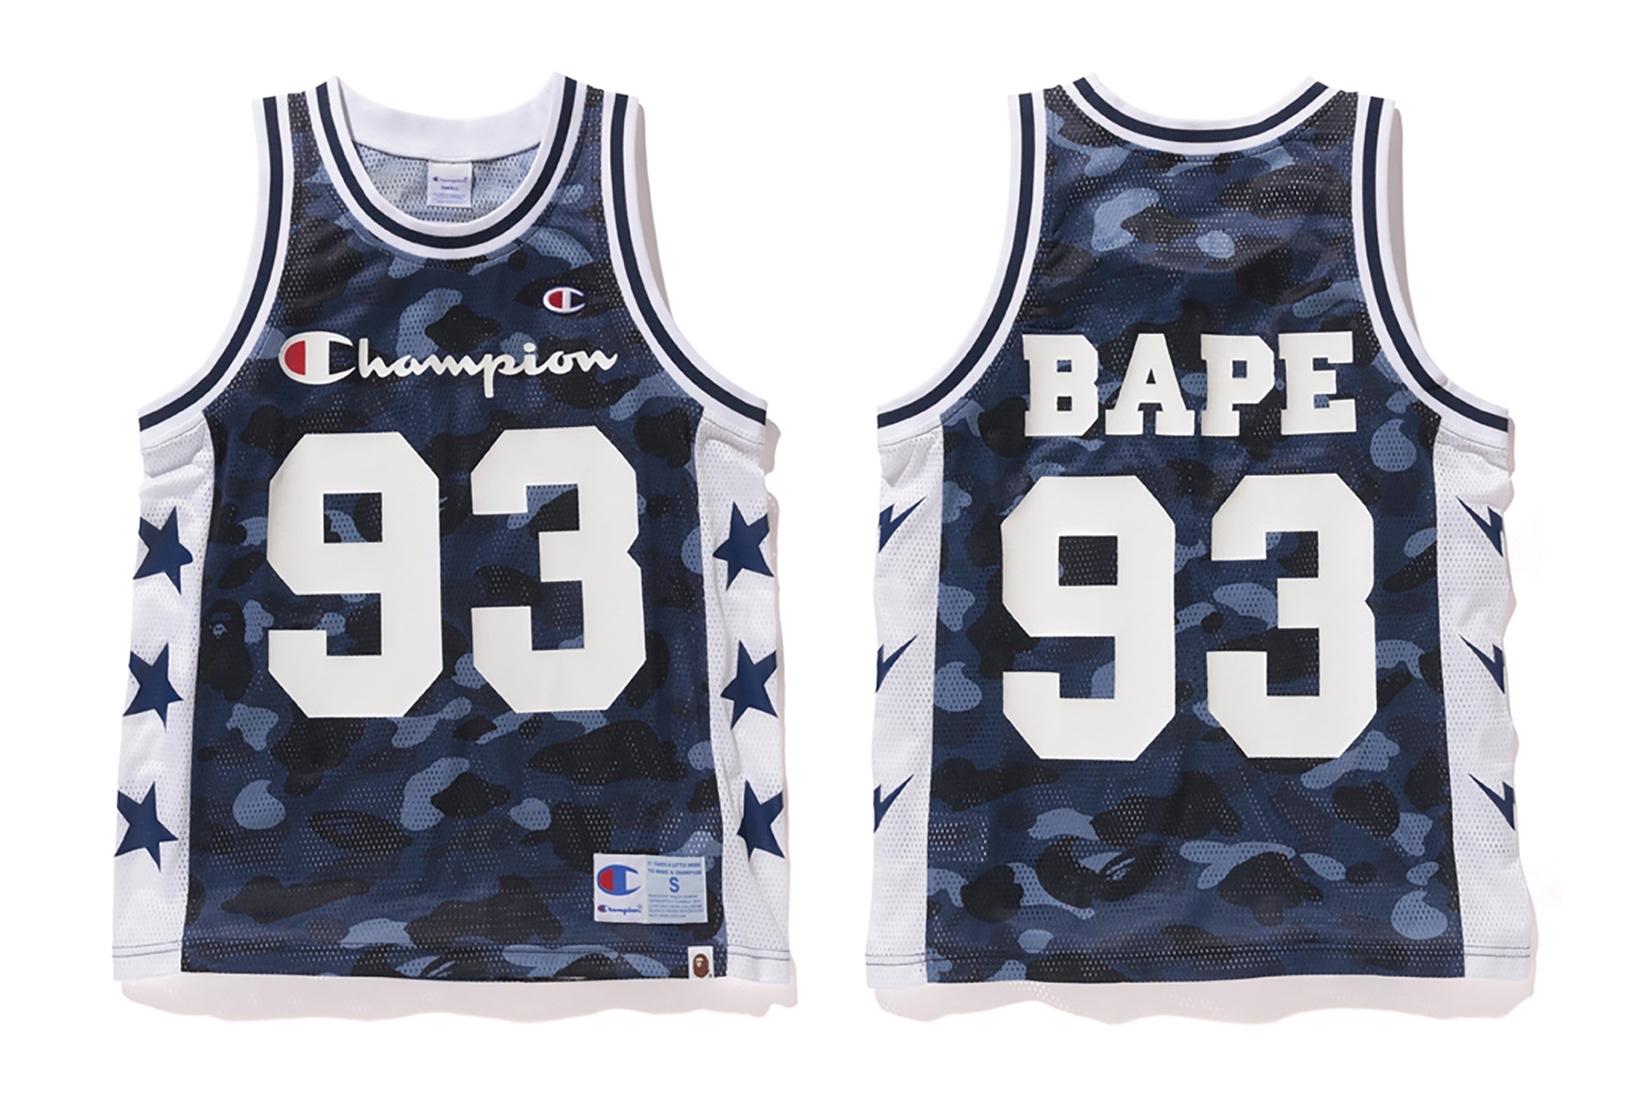 http---bae.hypebeast.com-files-2017-04-Bape-X-Champion-SS-2017-09